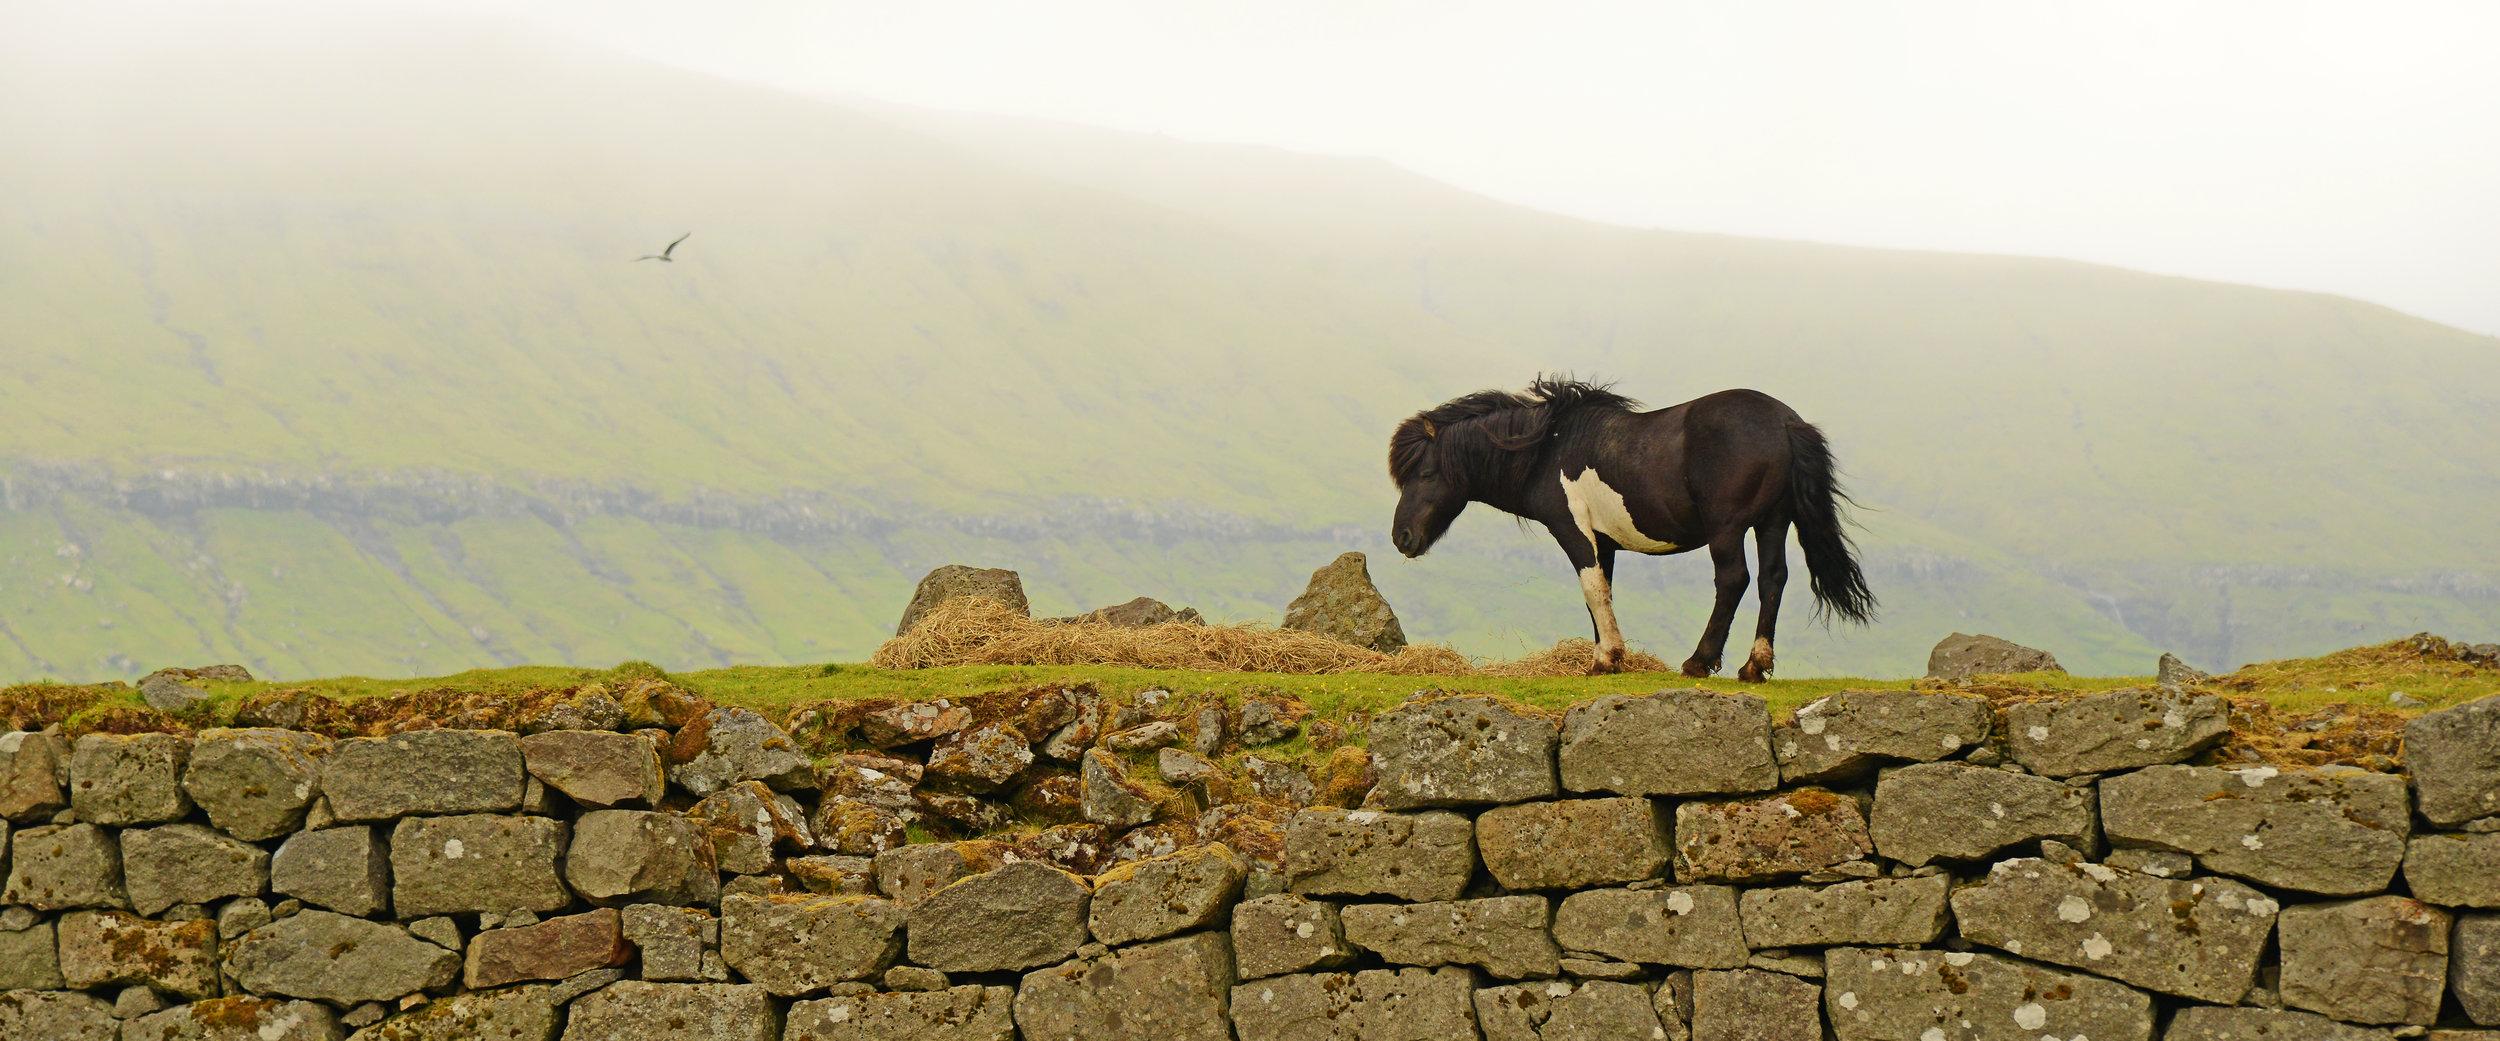 DSC_1108. Prince. Faroese stallion. Signabø, Streymoy, FI. 6-2018. altered .jpg